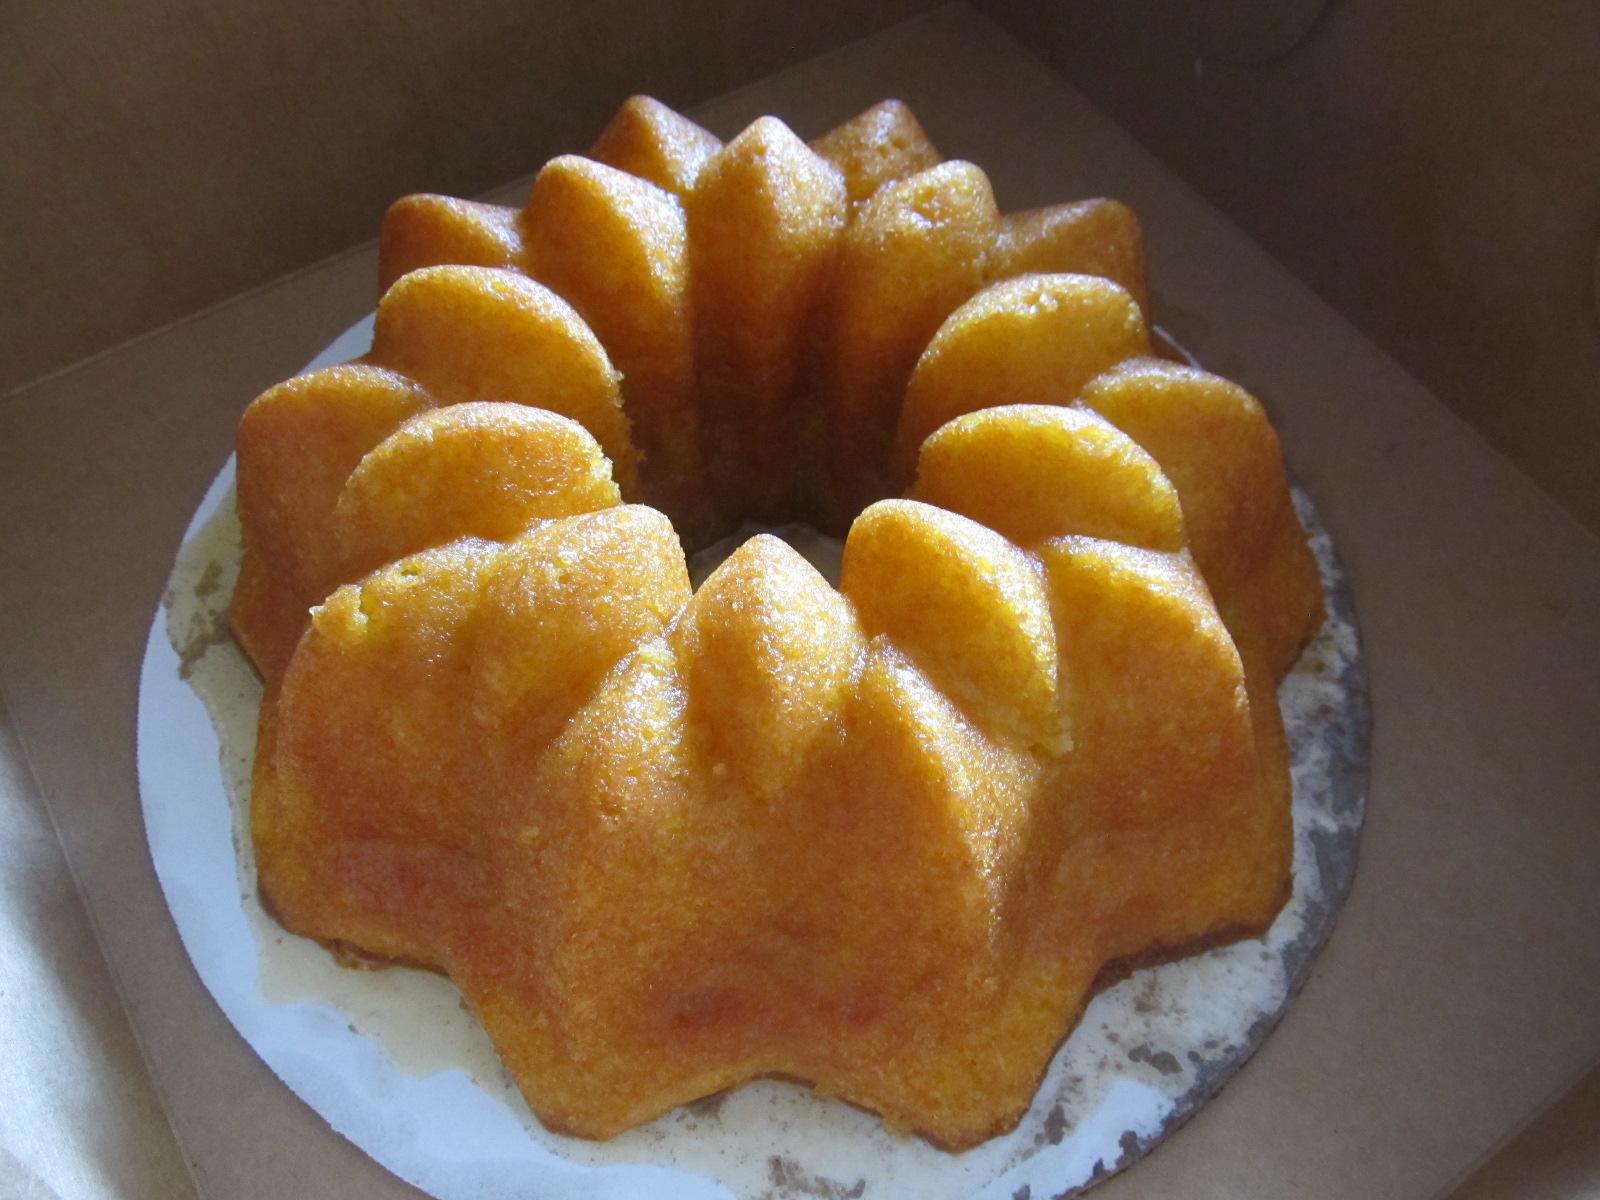 Apricot Nectar Cake Recipe Lemon Jello: Lemon Cake Apricot Nectar Recipe